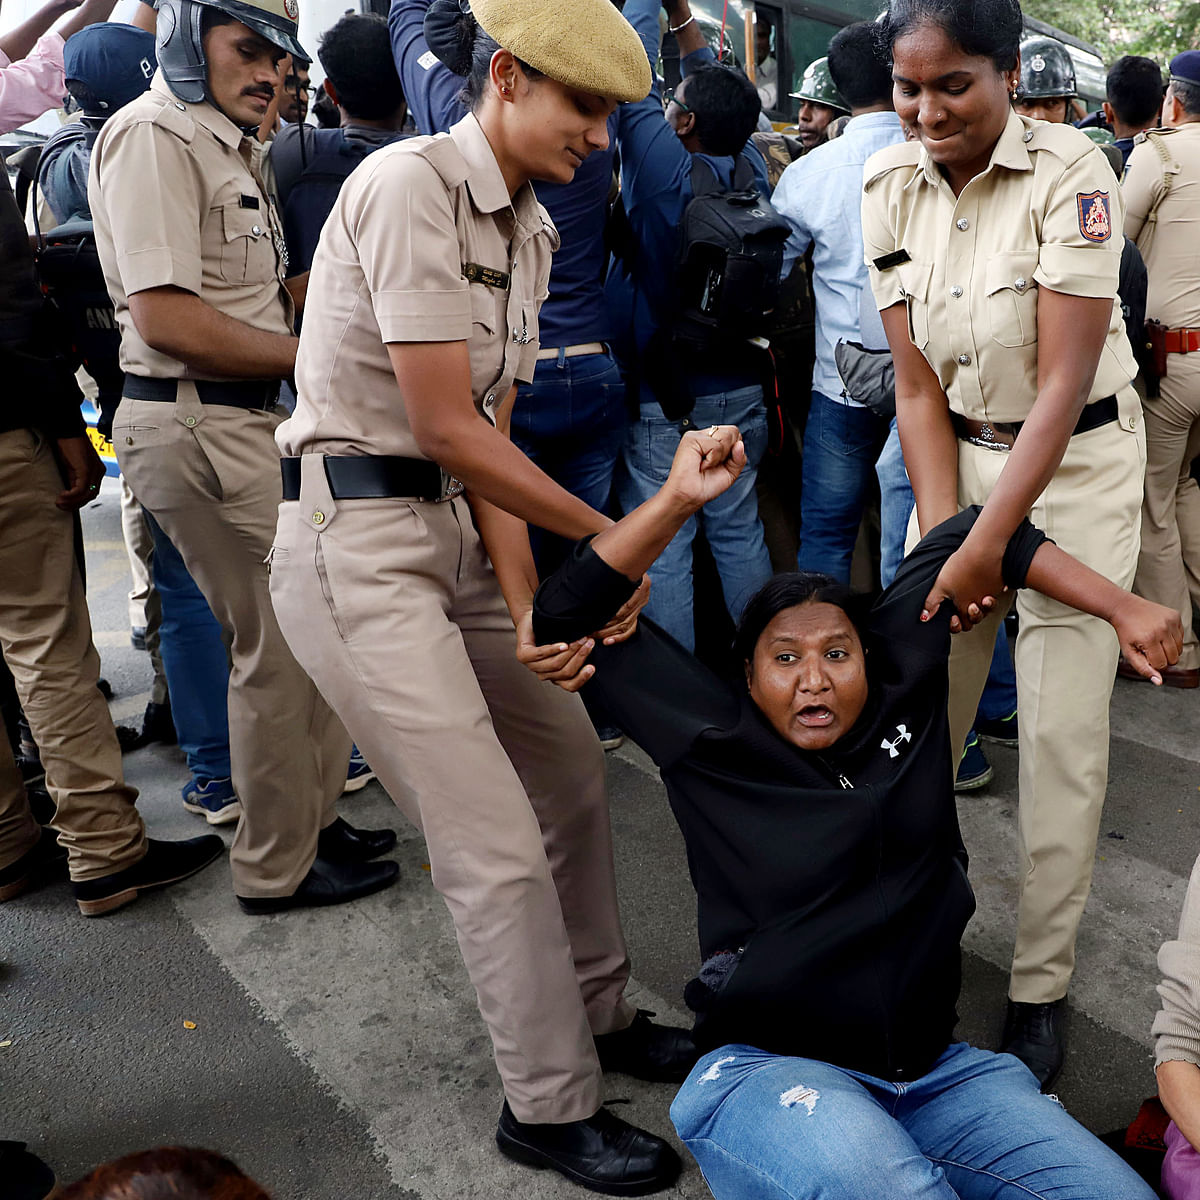 As Bengaluru Police warns social media users, Karnataka Minister CT Ravi warns about 'majority losing patience'